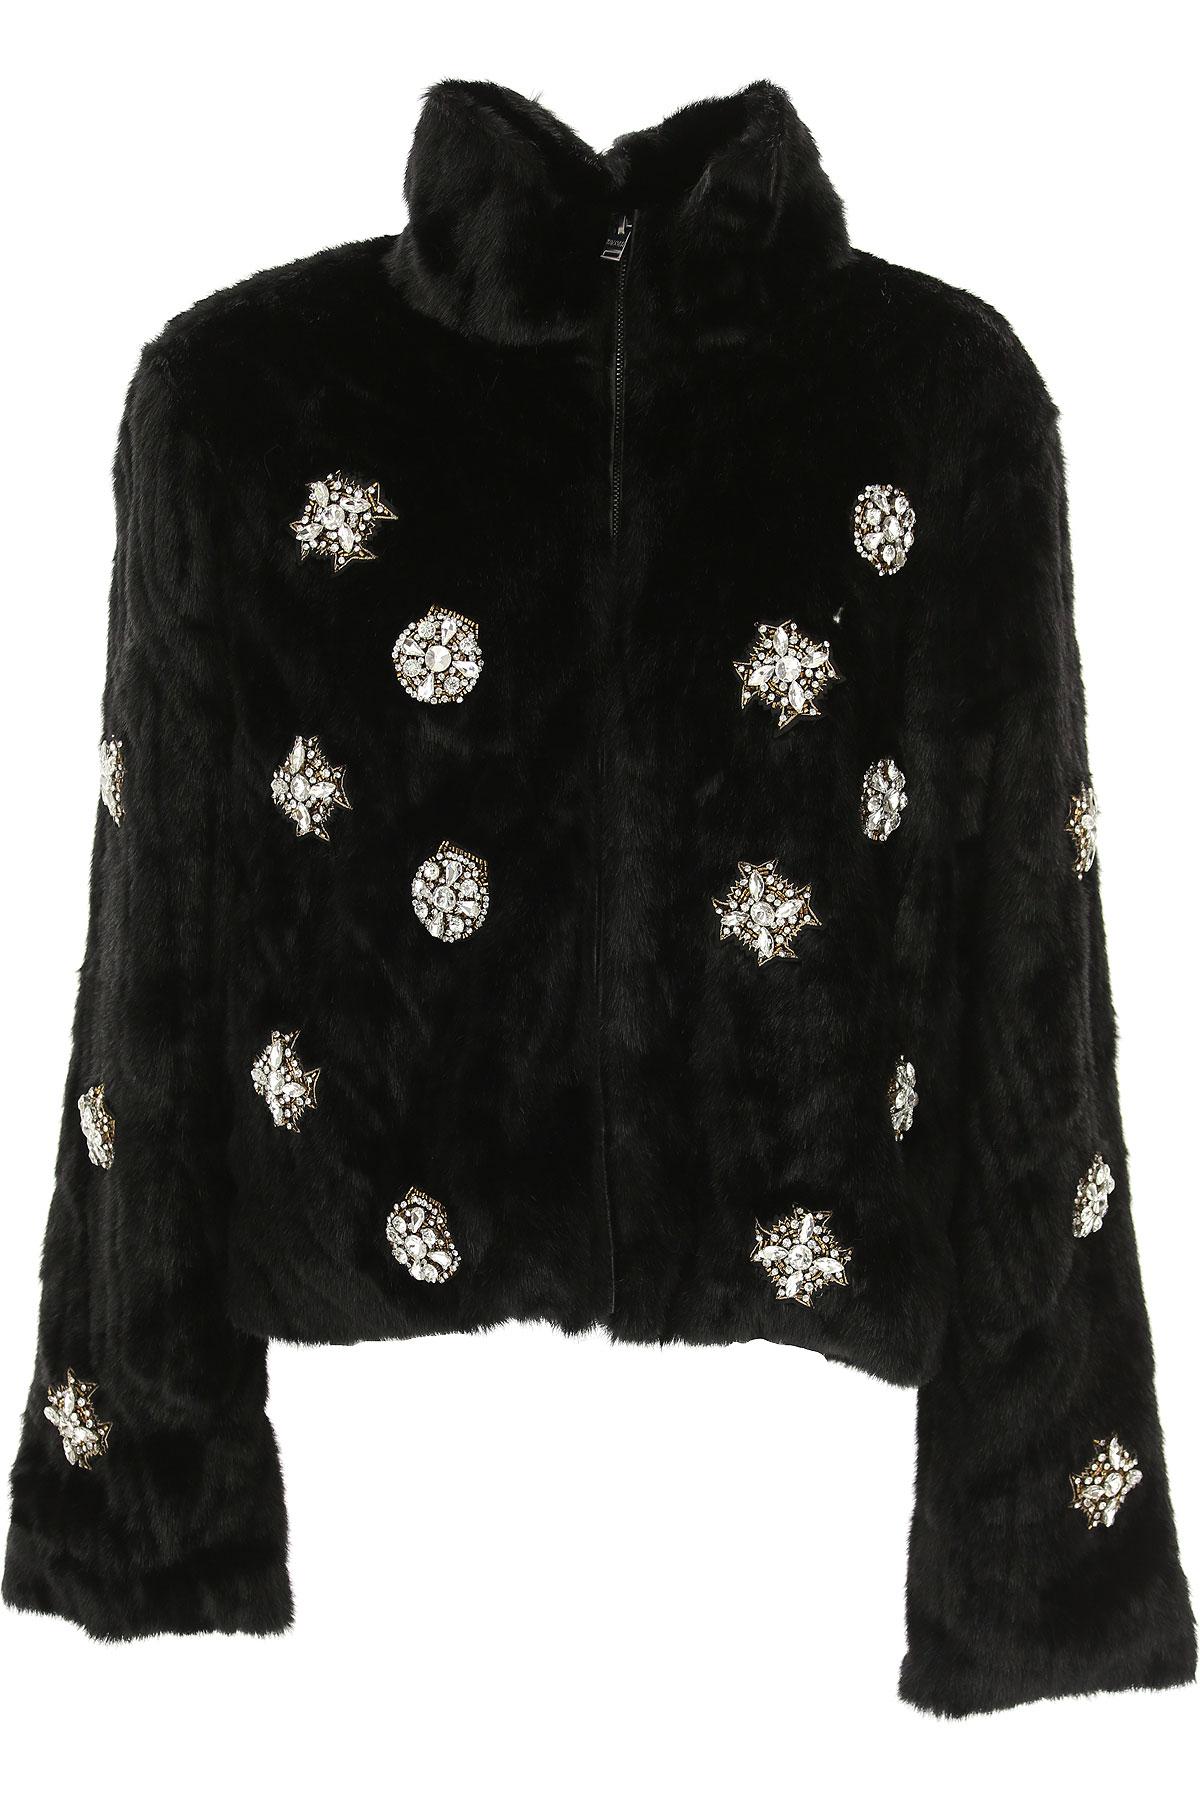 Image of Silvian Heach Jacket for Women, Black, Fur, 2017, 4 6 8